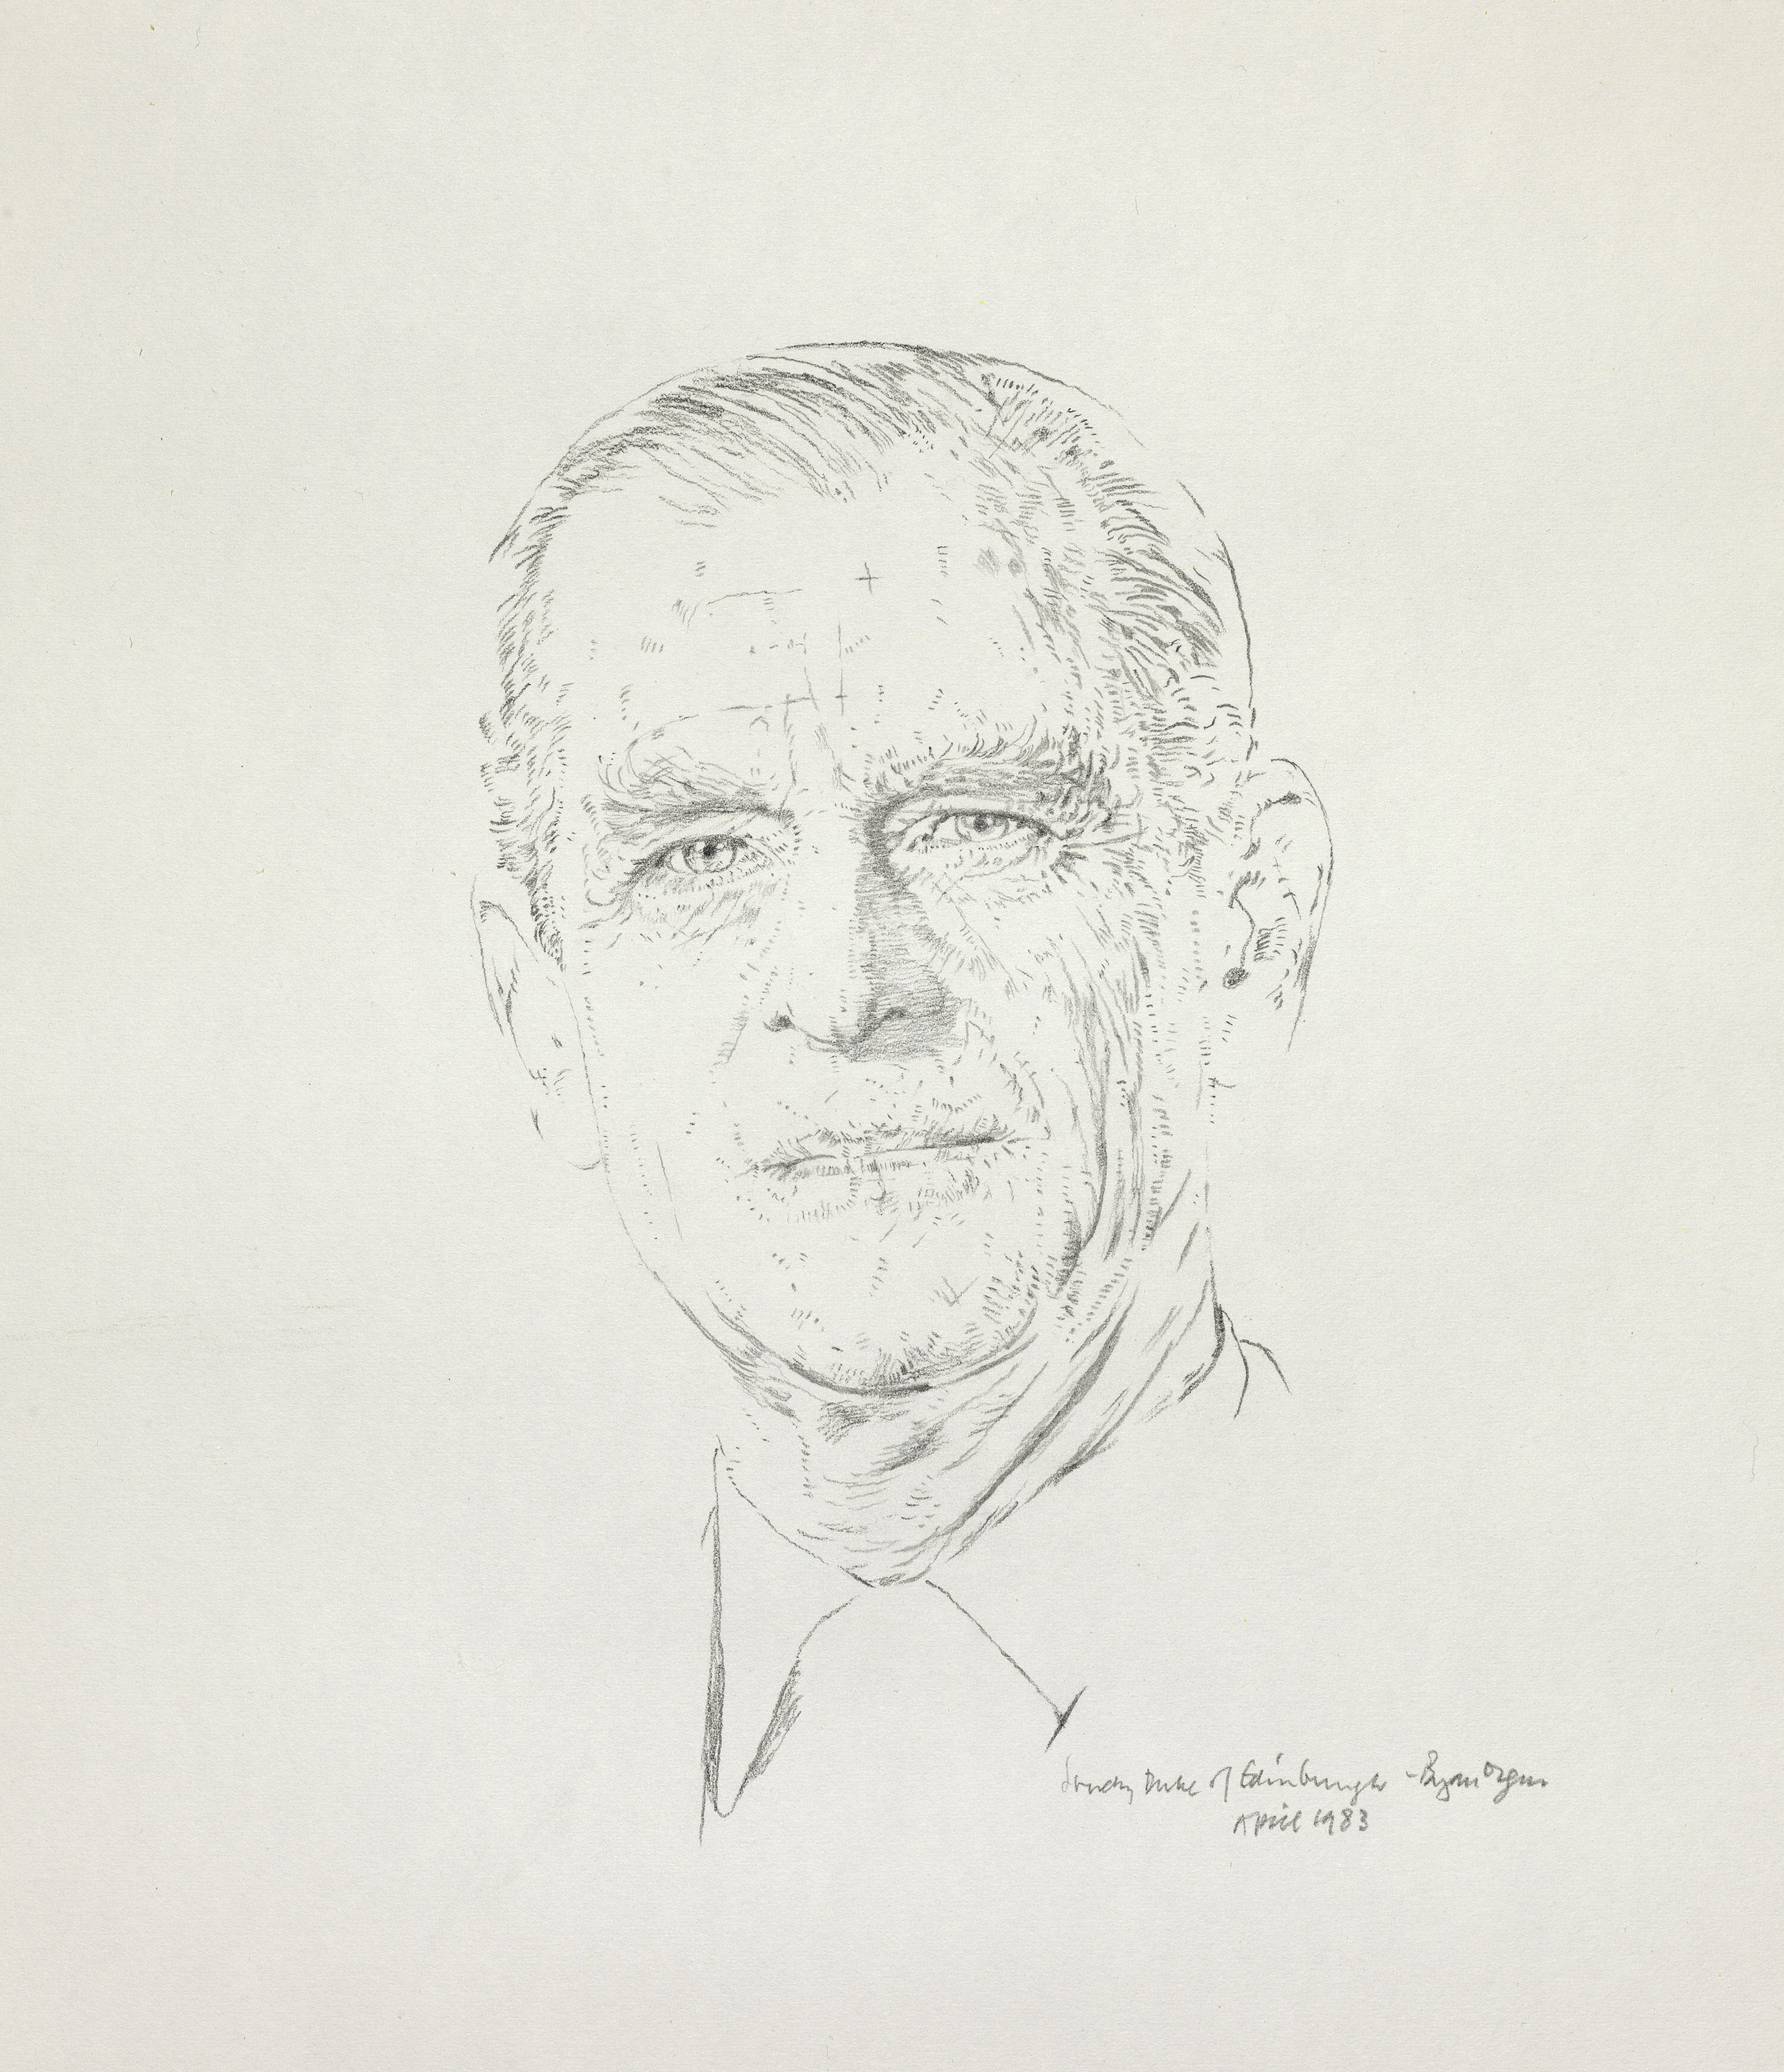 Bryan Organ, HRH The Duke of Edinburgh, 1983